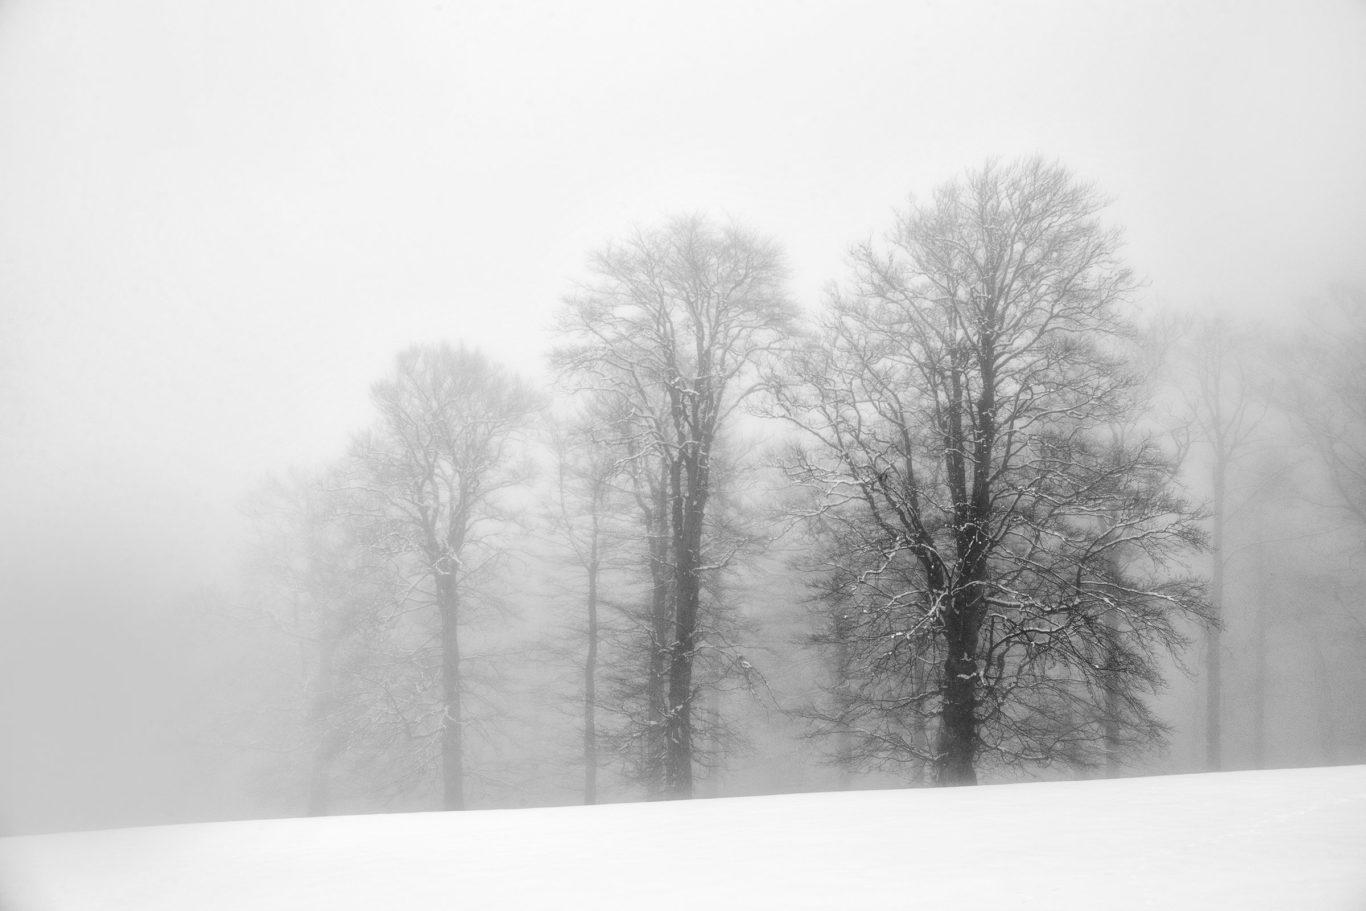 0107-Redbull-Oslea-Hiride-2016-fotograf-Ciprian-Dumitrescu-DC1X4015